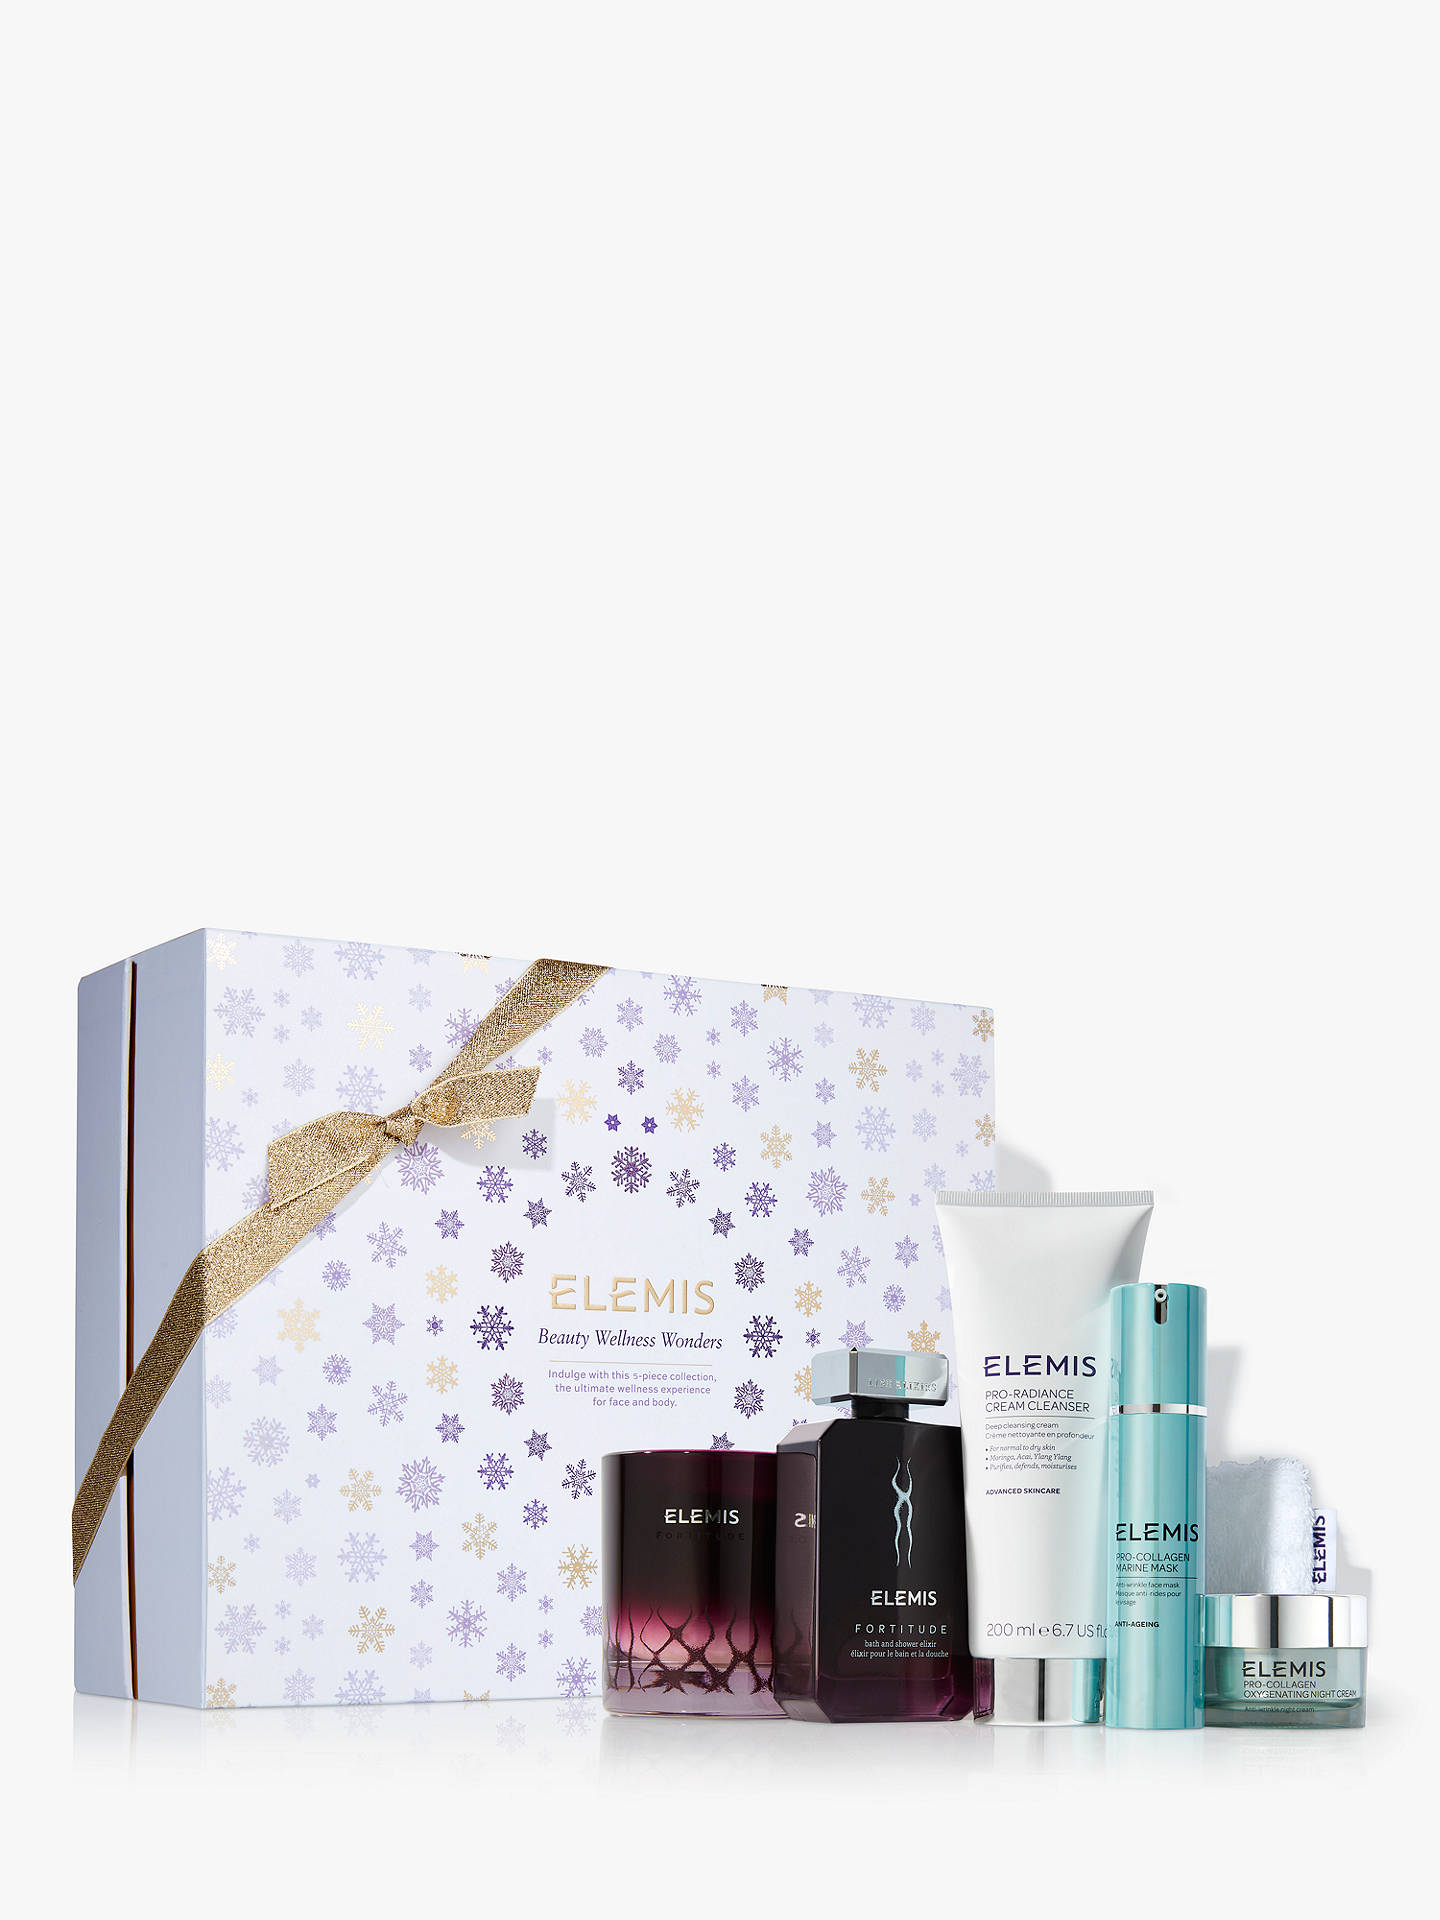 BuyElemis Beauty Wellness Wonders Skincare Gift Set Online at johnlewis.com